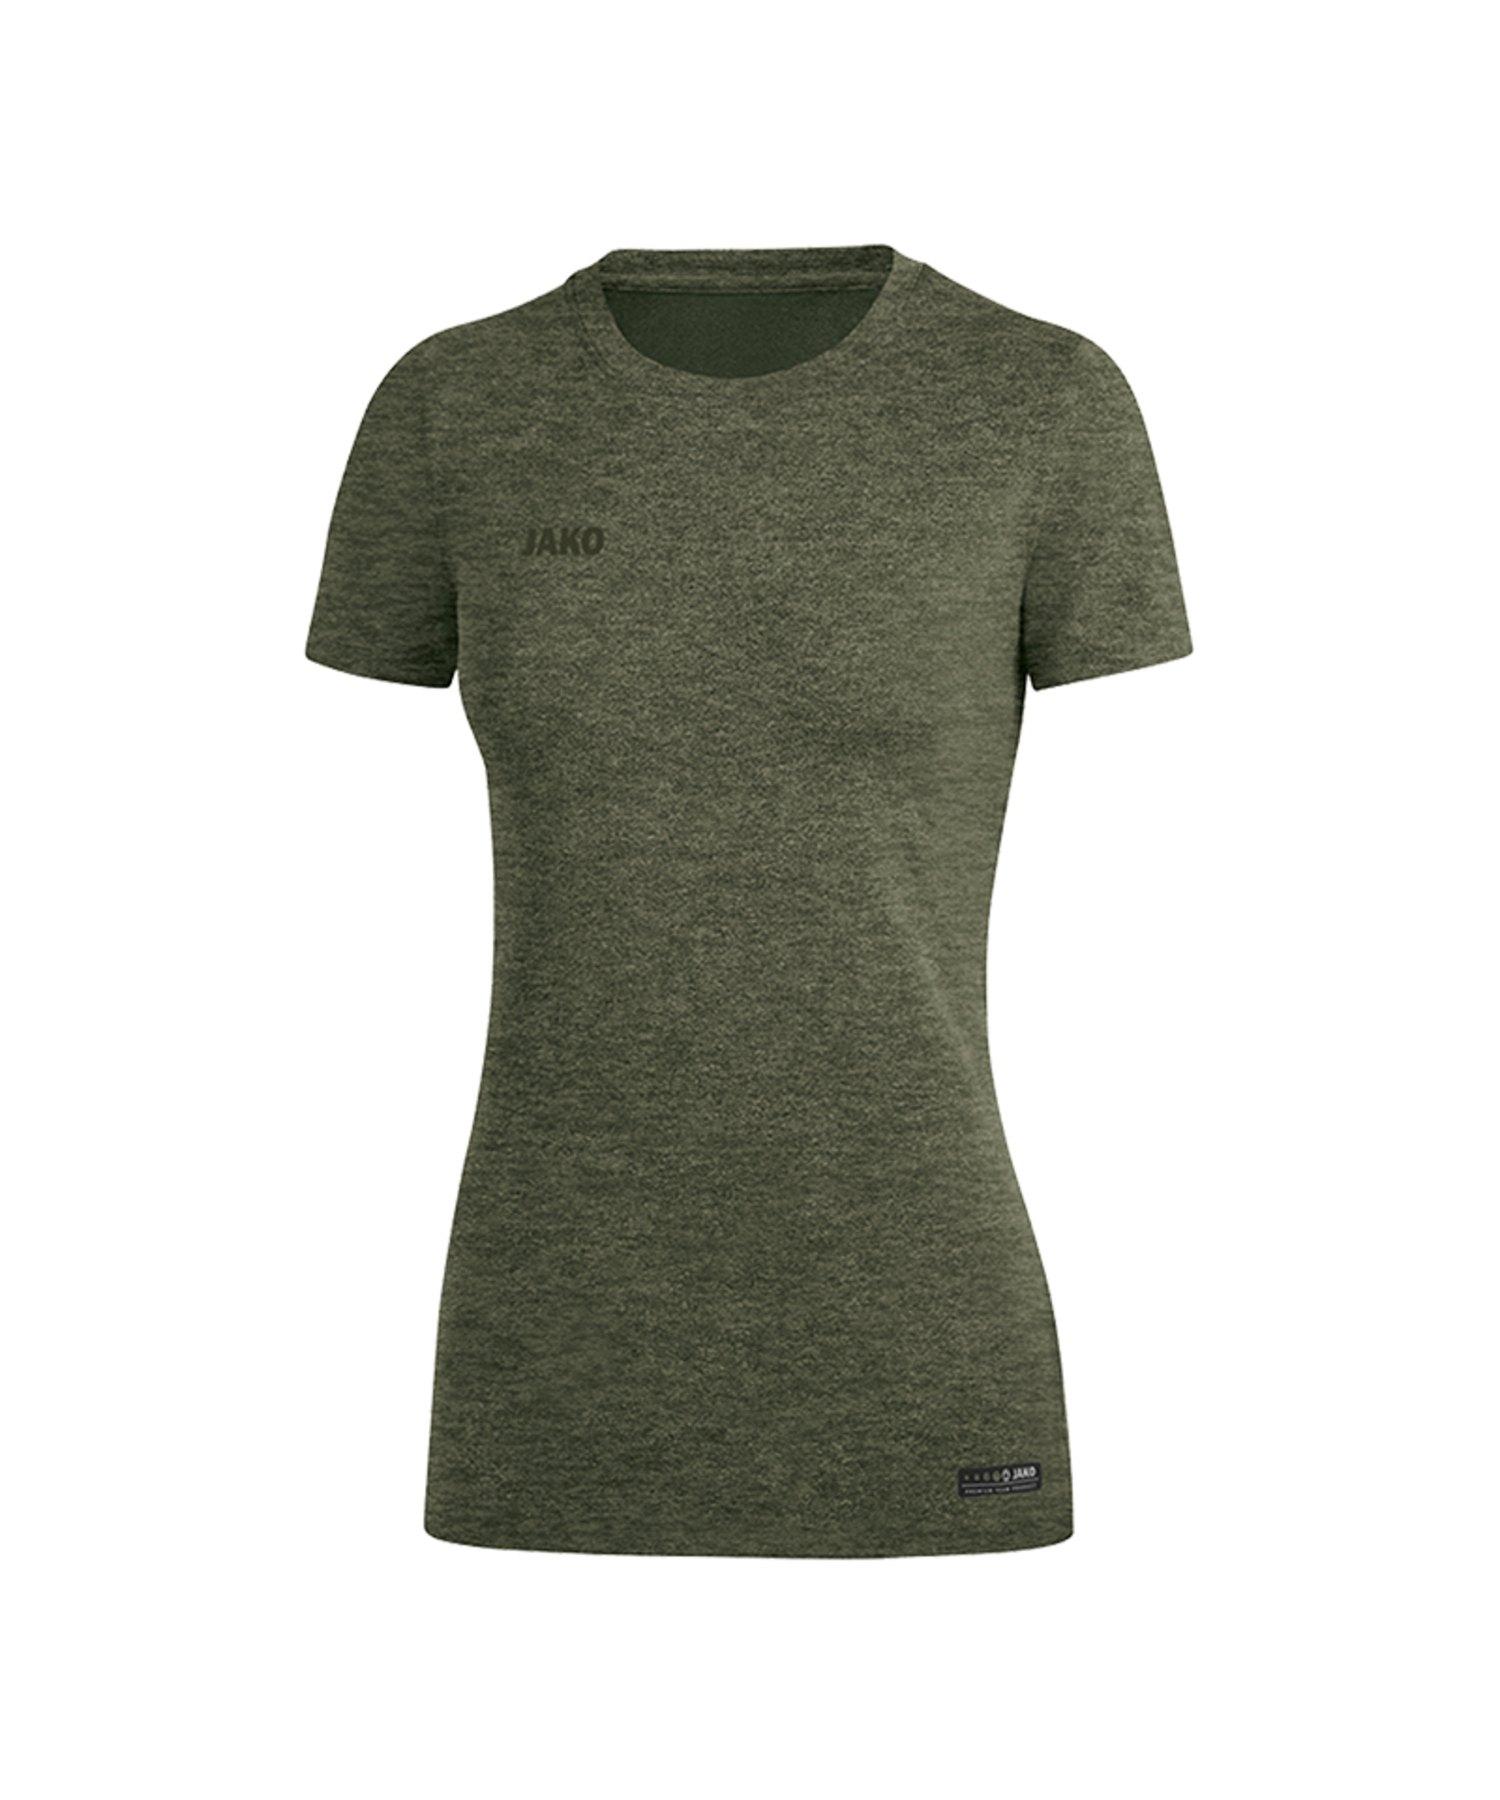 Jako T-Shirt Premium Basic Damen Khaki F28 - Khaki